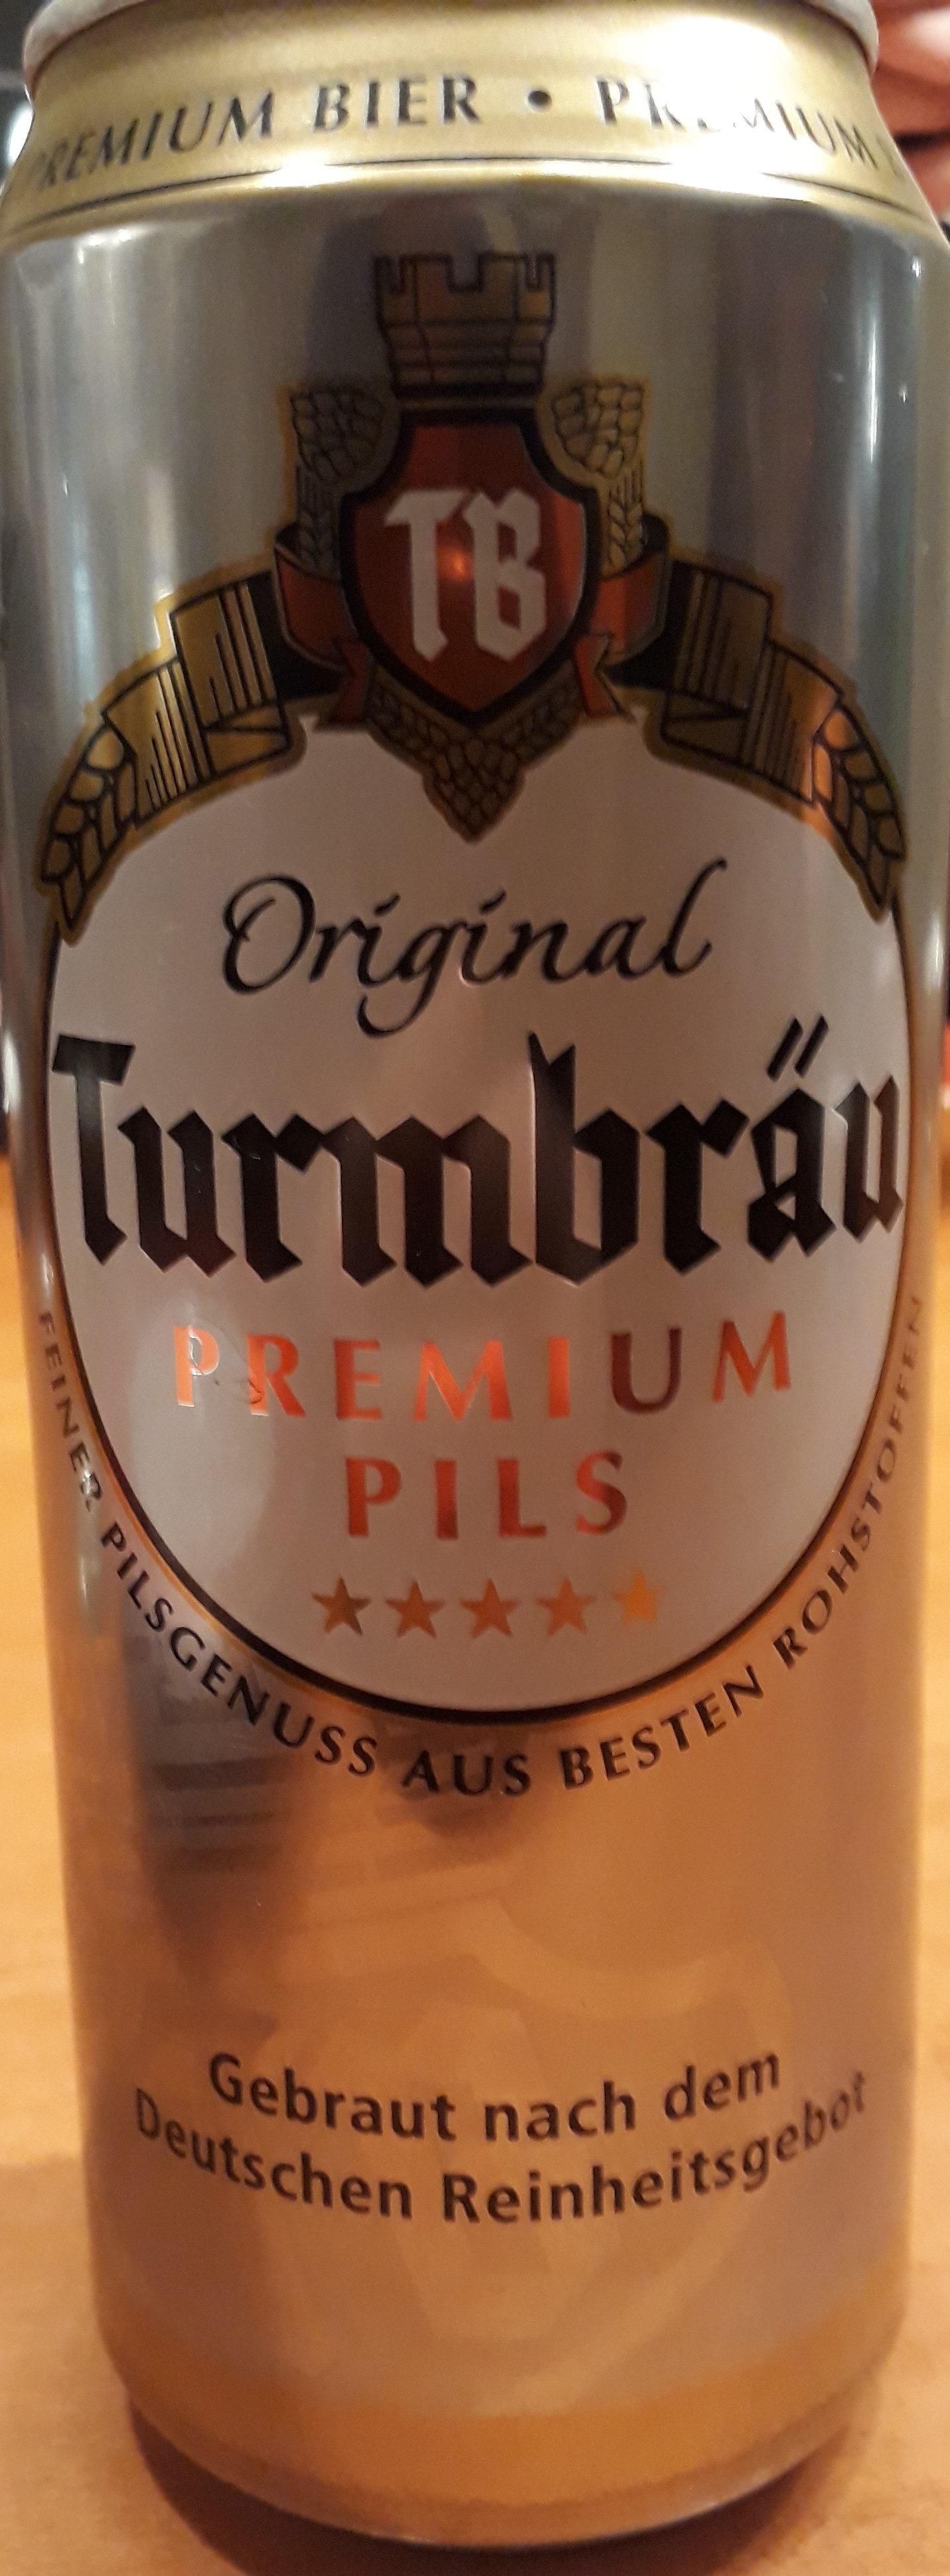 Original Turmbräu Premium Pils - Product